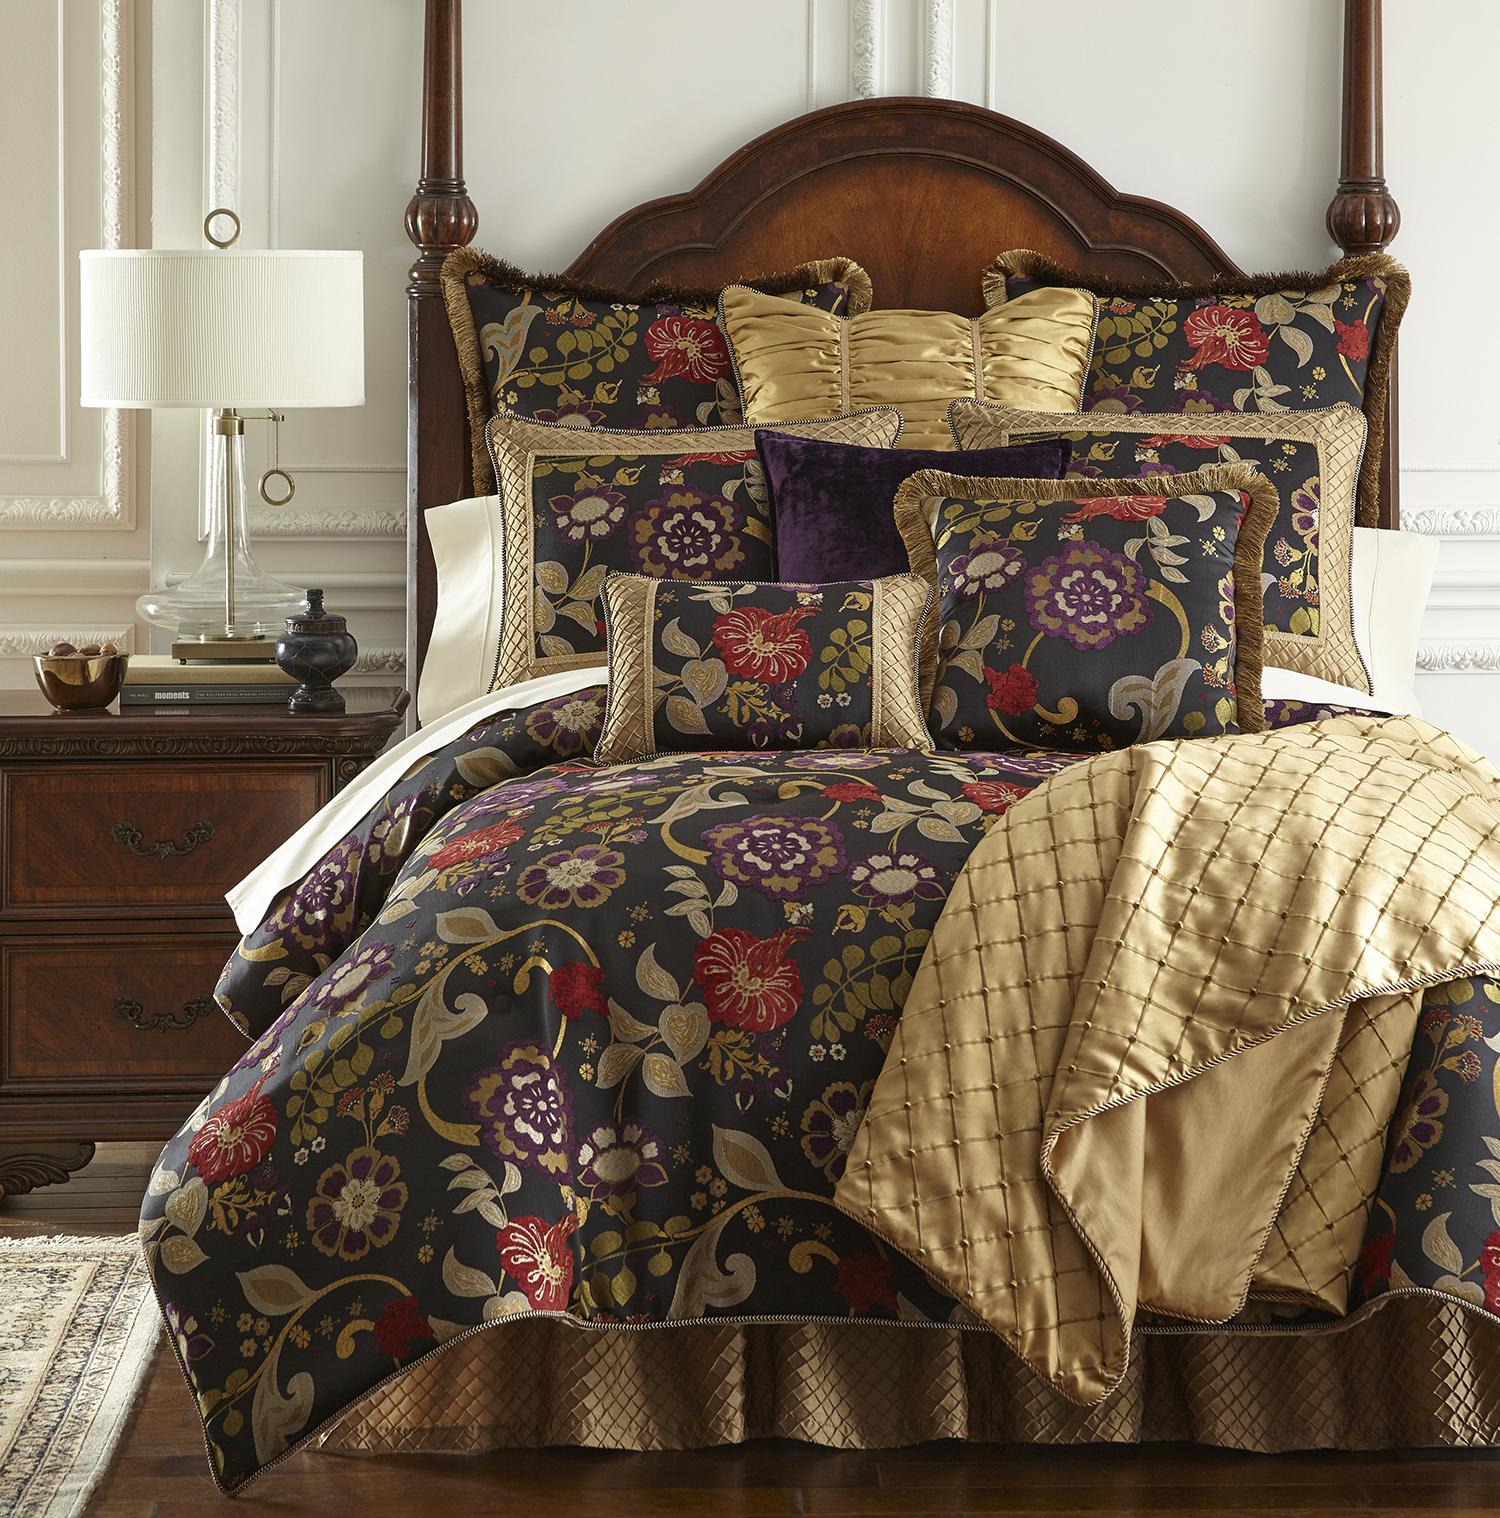 Escapade By Austin Horn Luxury Bedding Beddingsuperstore Com